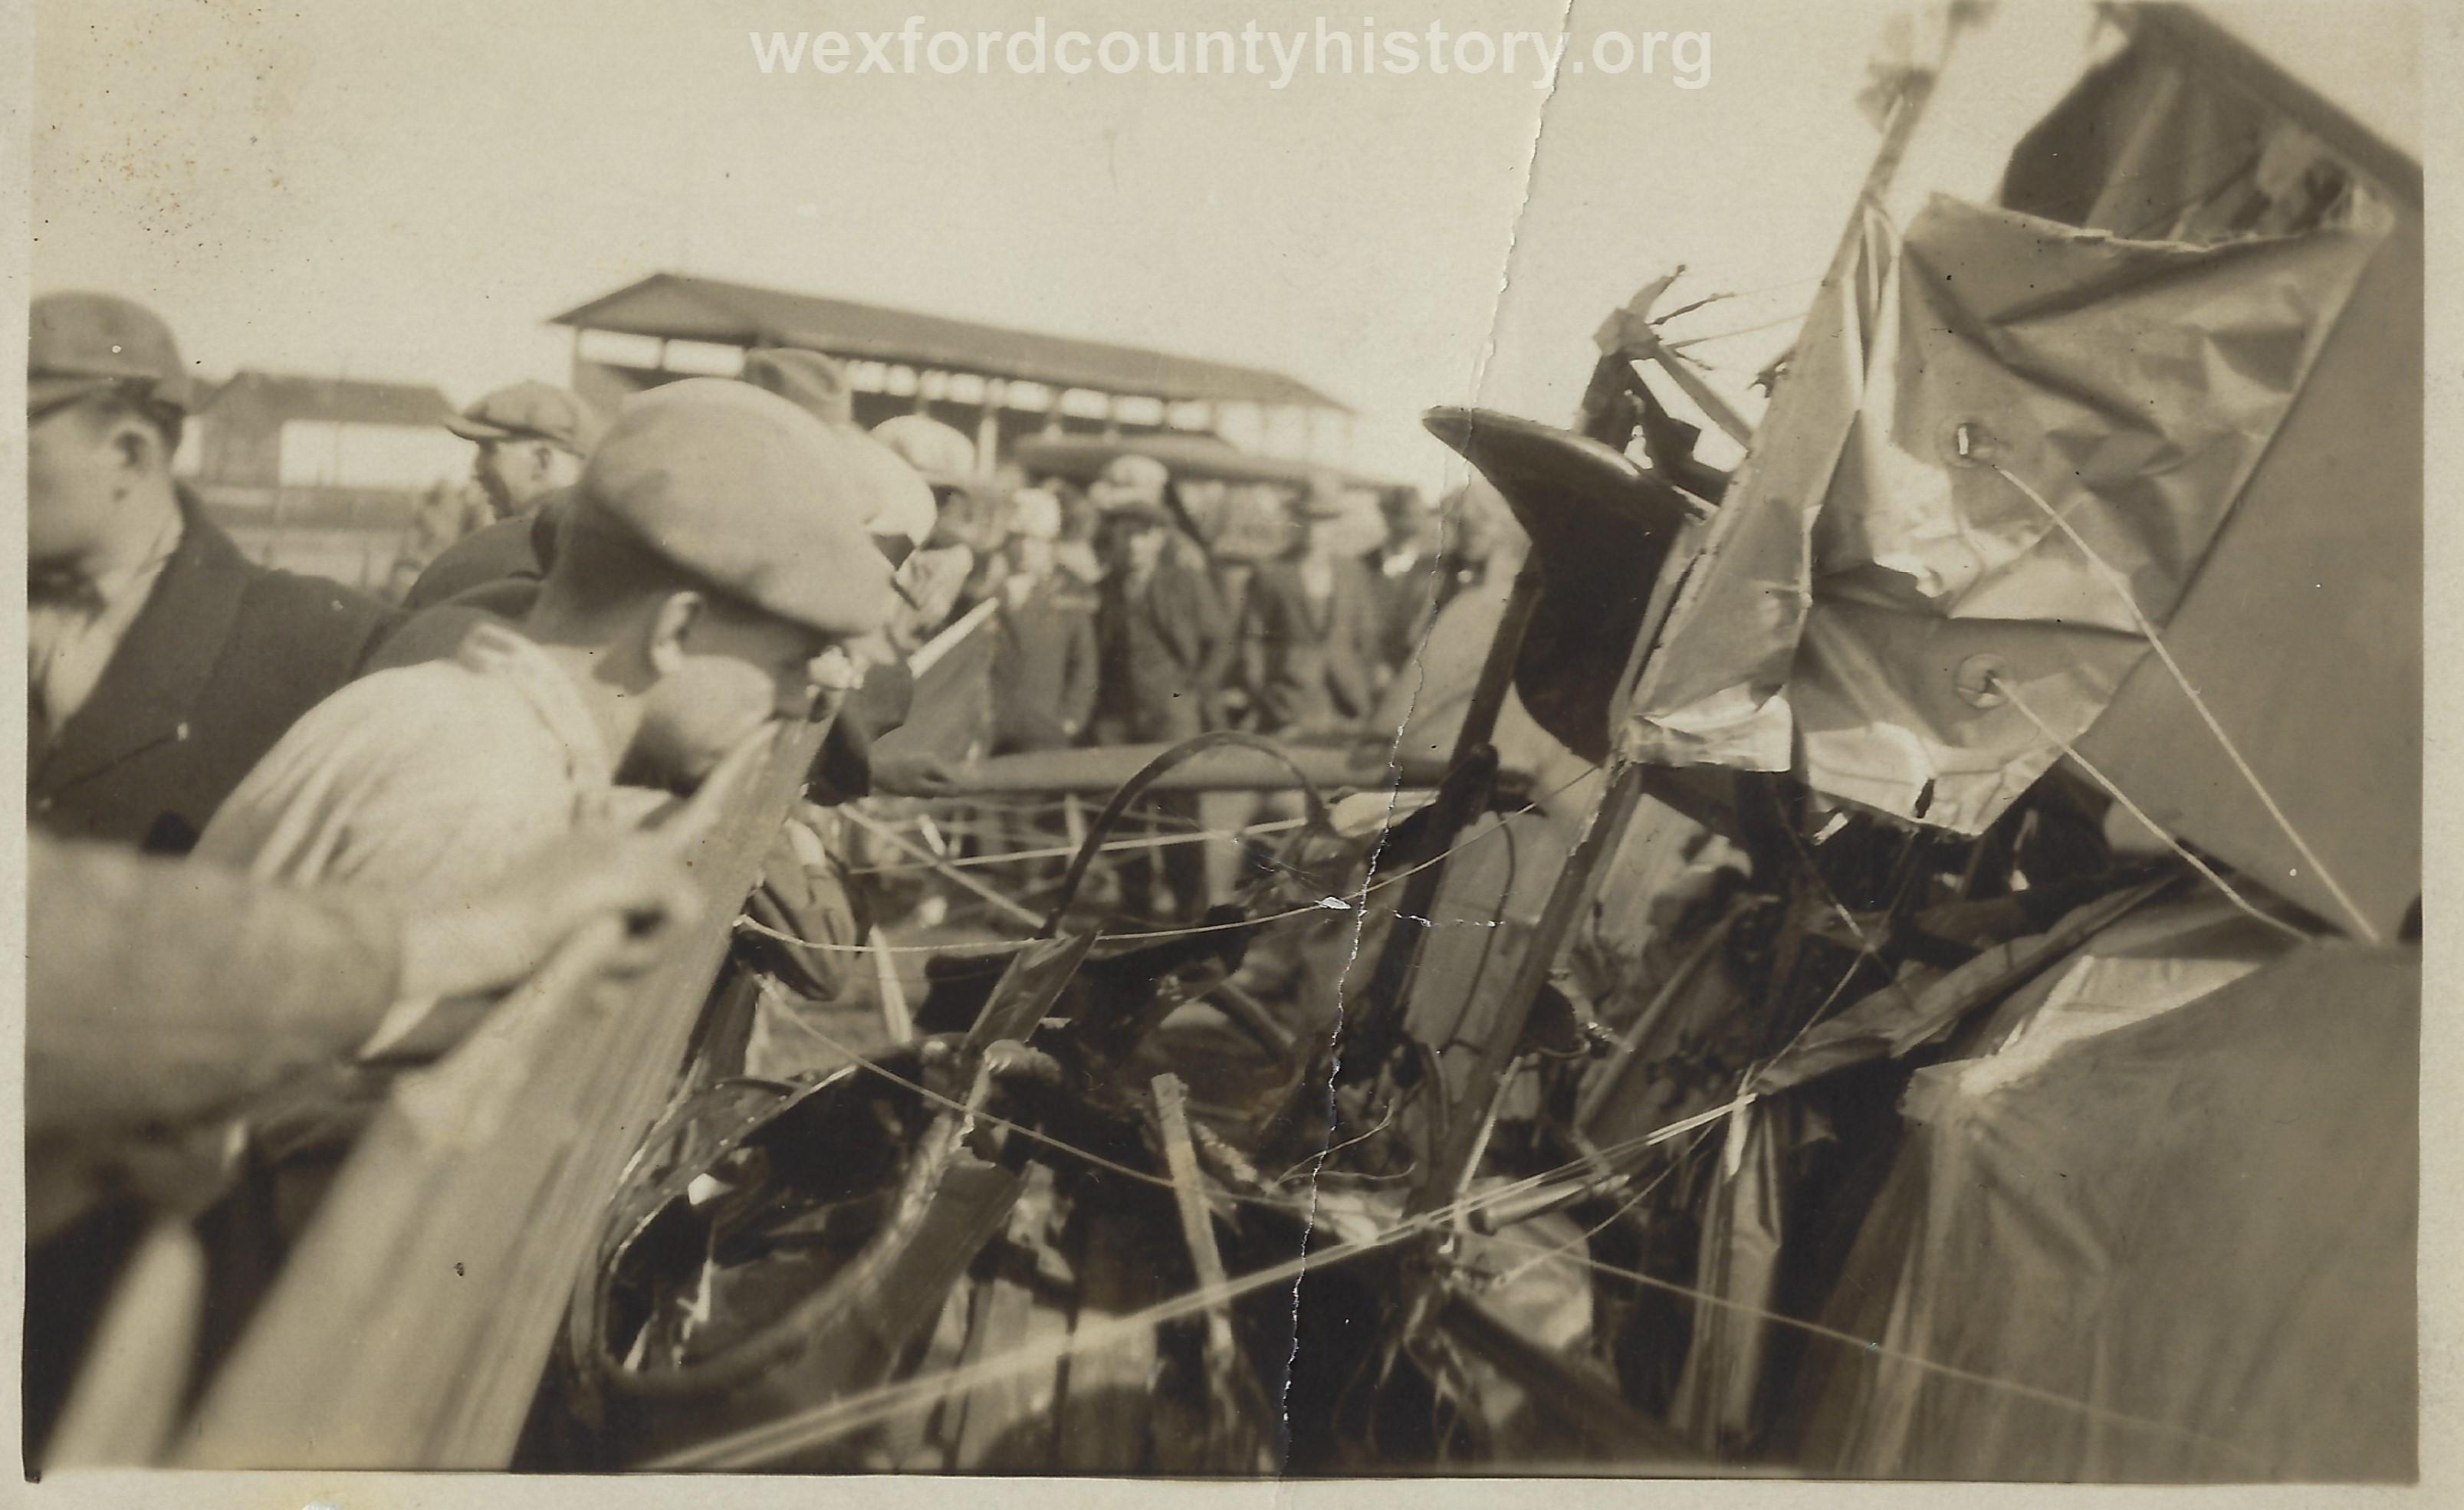 Cadillac-Misc-Airplane-Crash-At-The-Fairgrounds